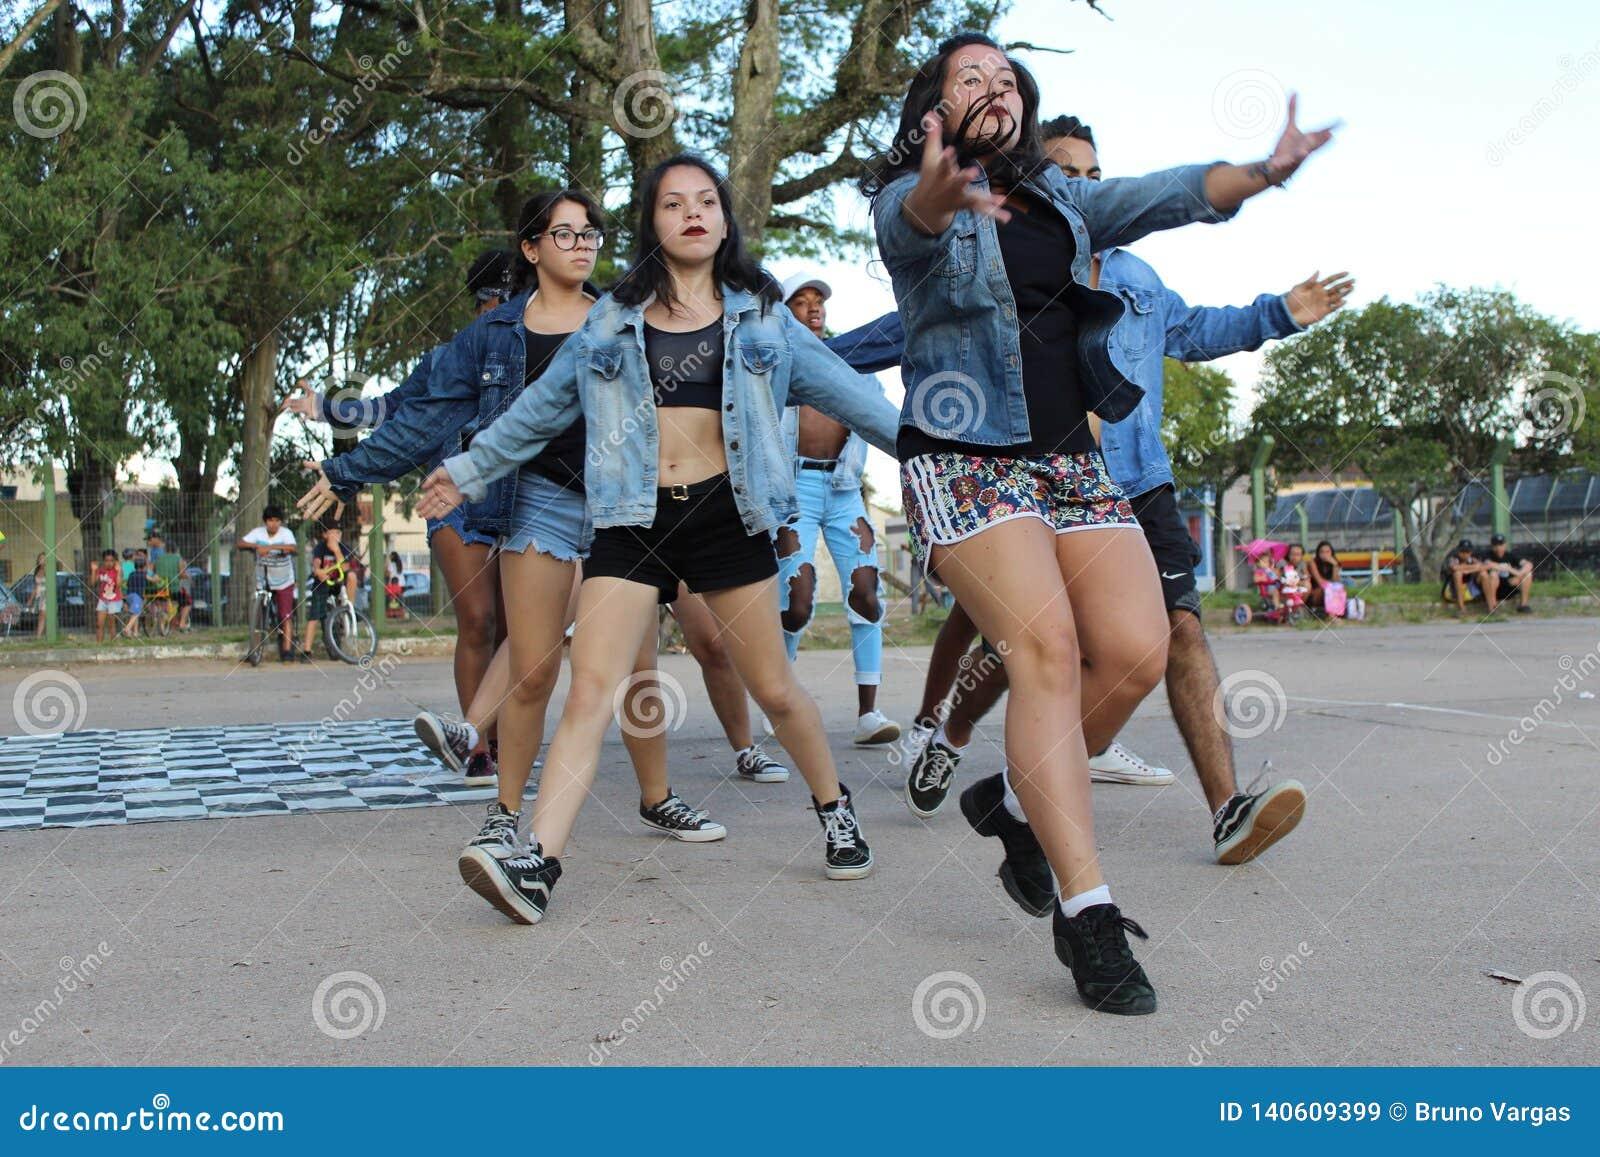 Dancers performing an outdoor street dance performance